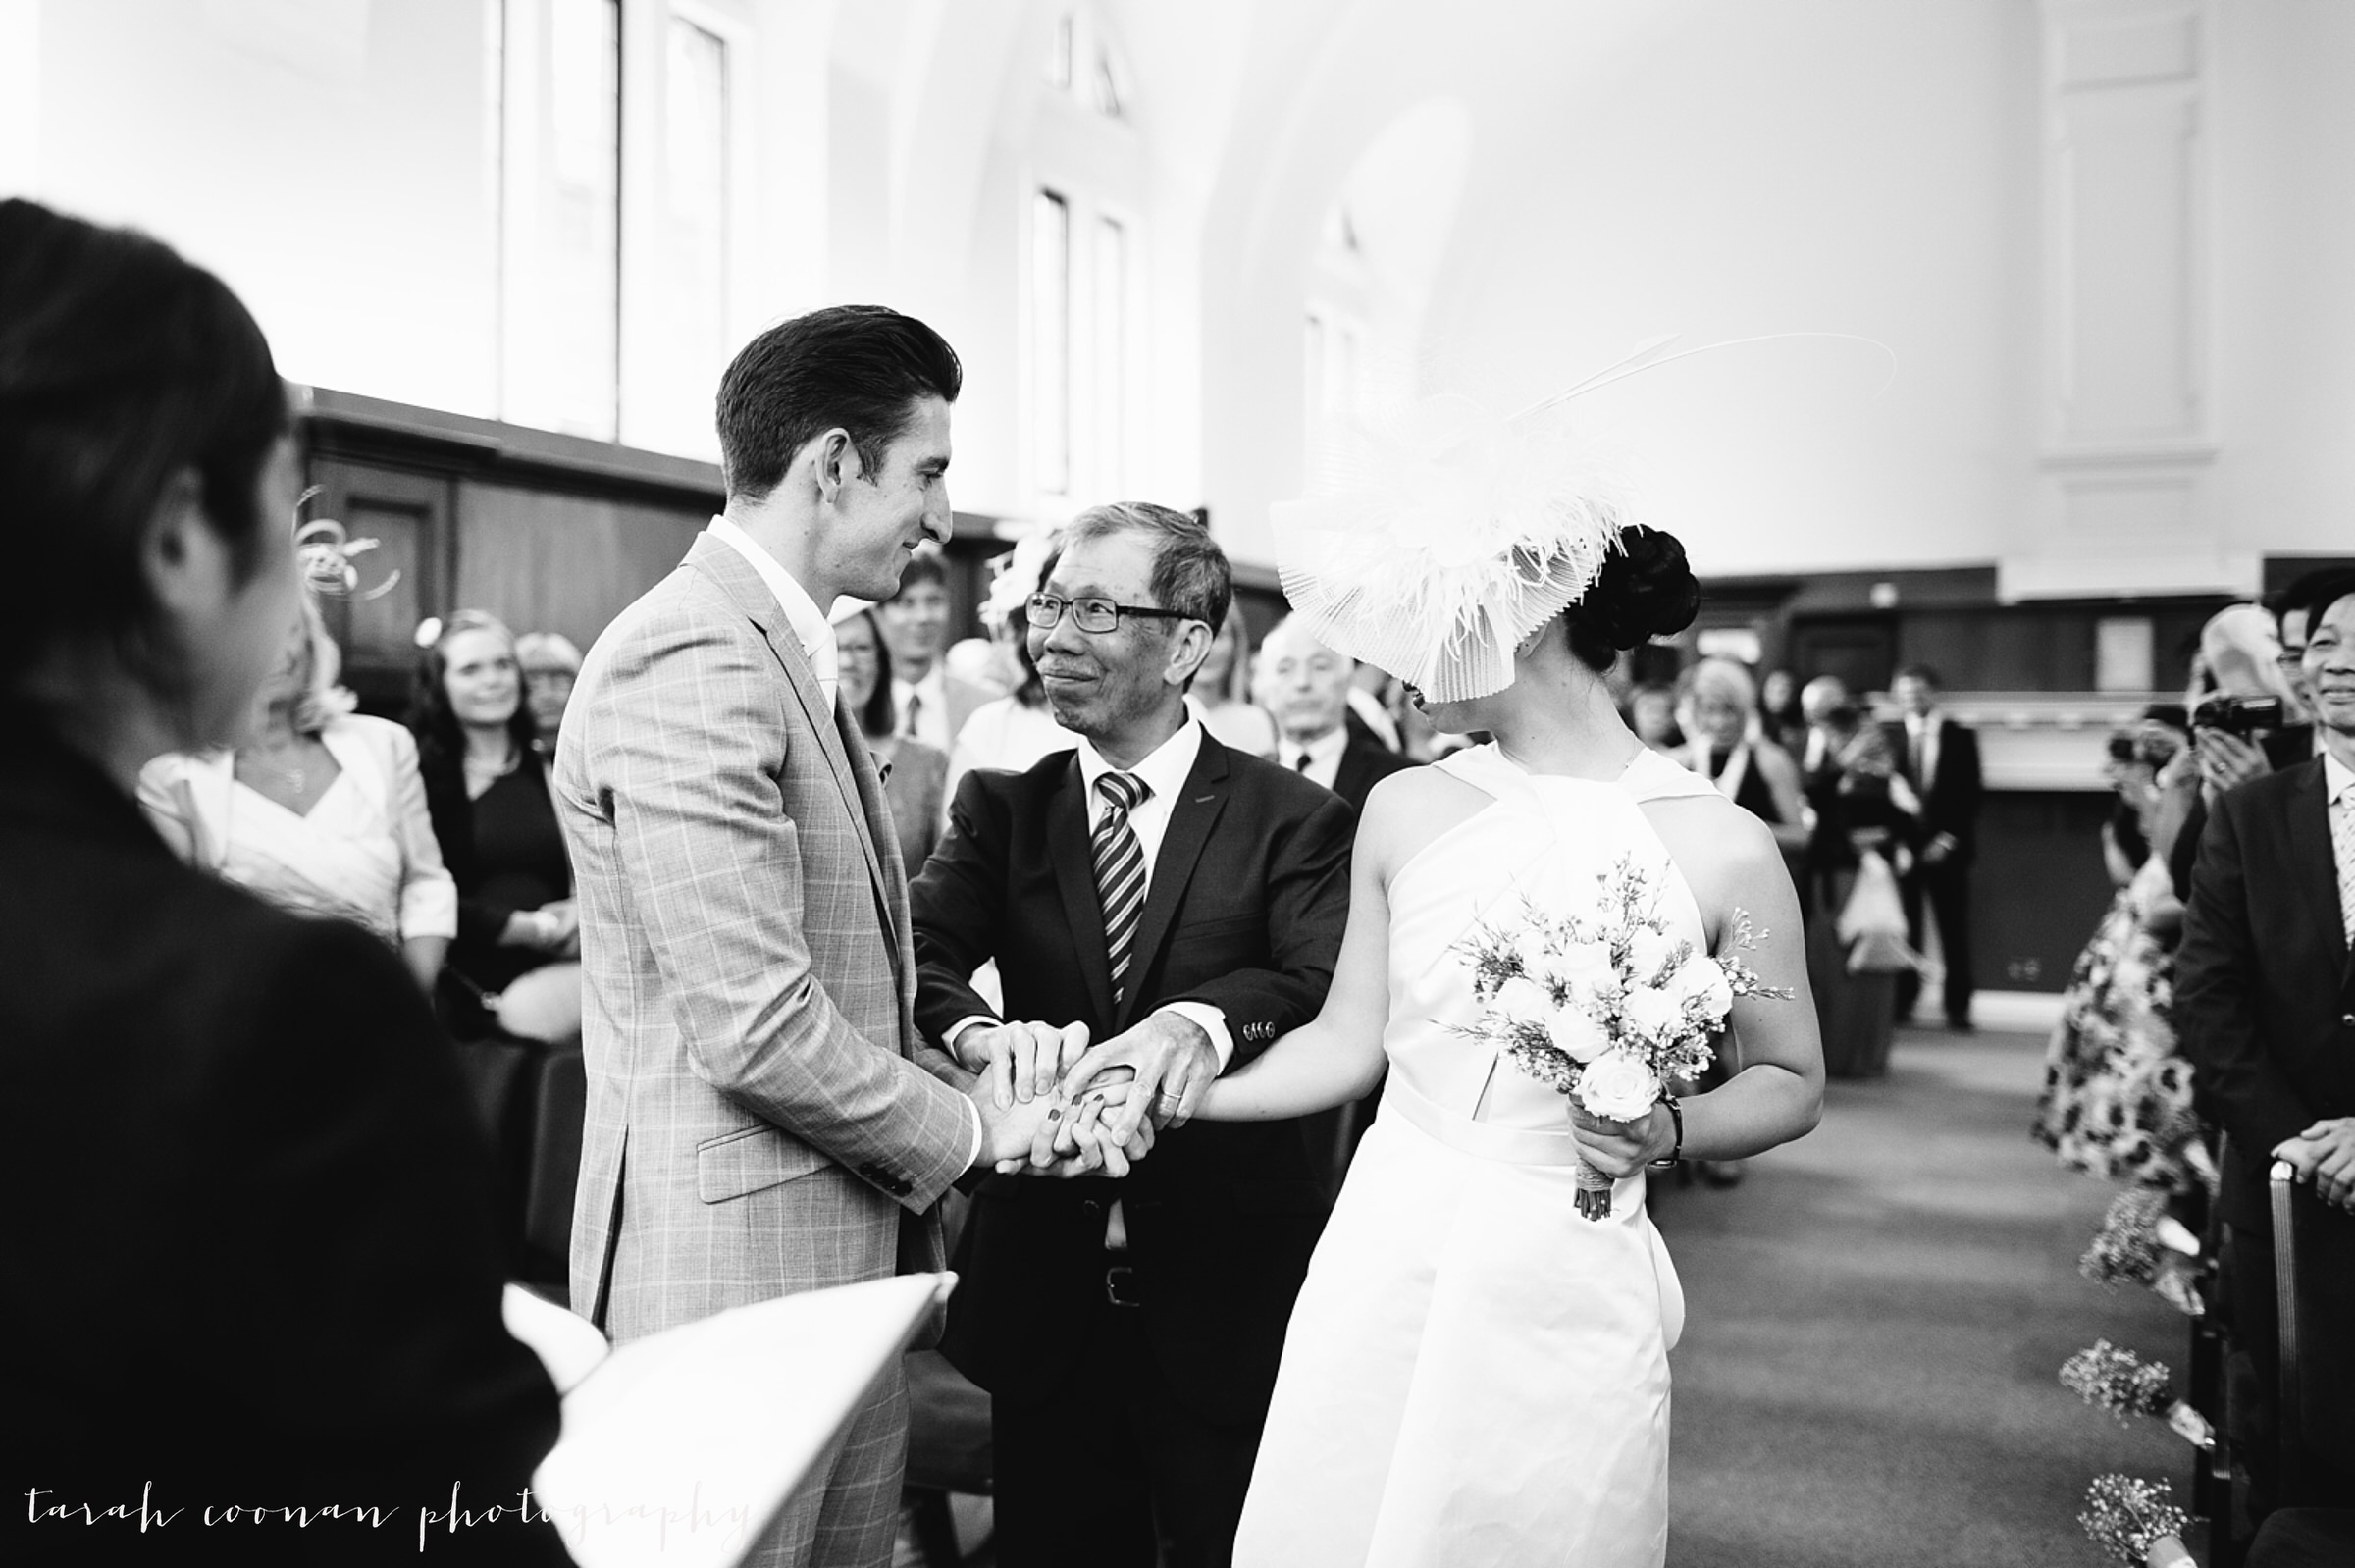 dulwich college wedding ceremony